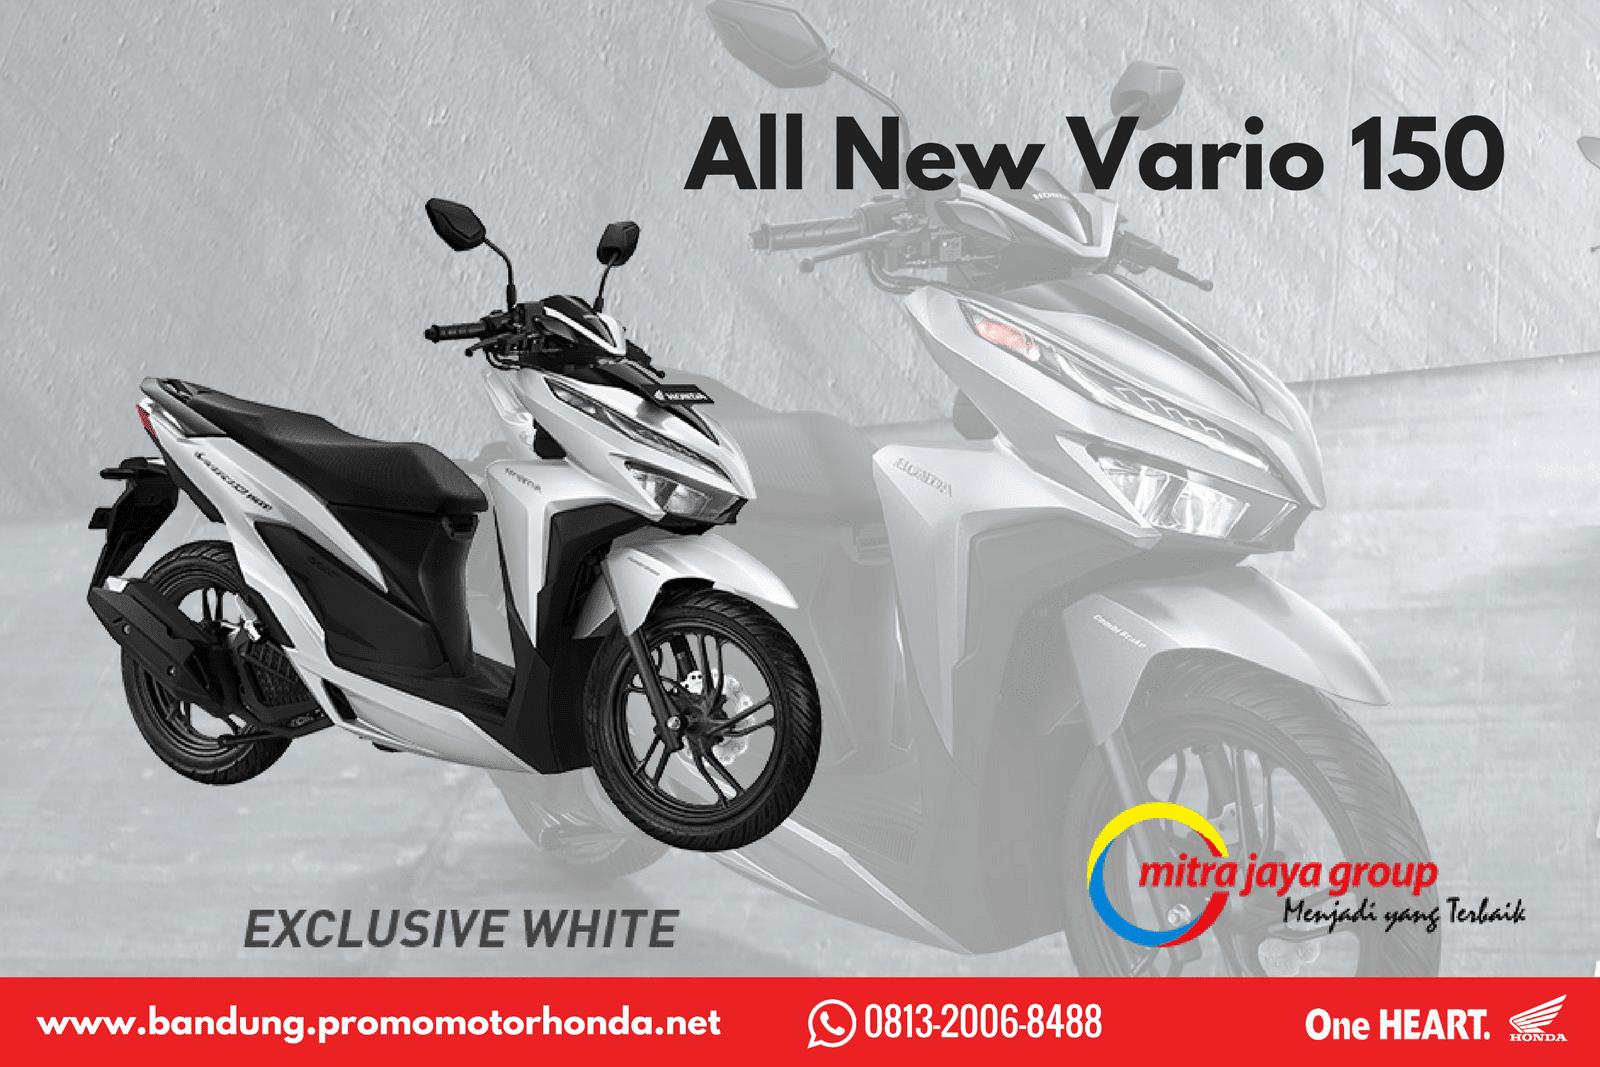 Daftar Harga Motor Honda 2018 Bandung New Vario 125 Esp Cbs Iss Bionic Red Klaten All 150 Tahun Kredit